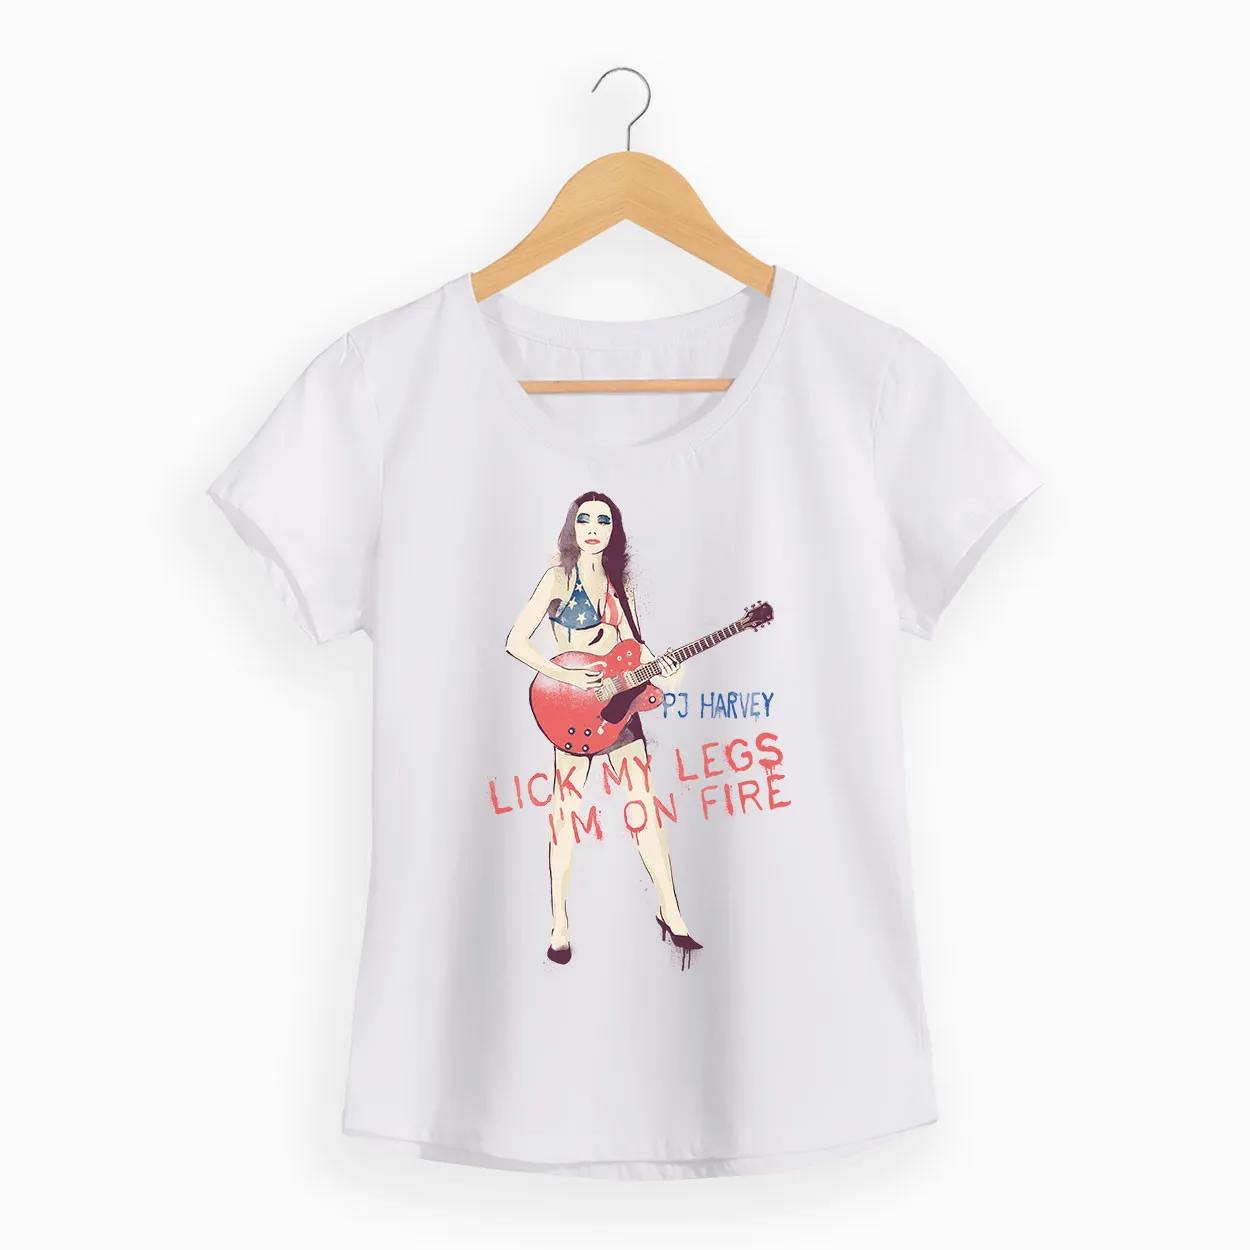 Camiseta  - Lick My Legs - PJ Harvey - Feminino